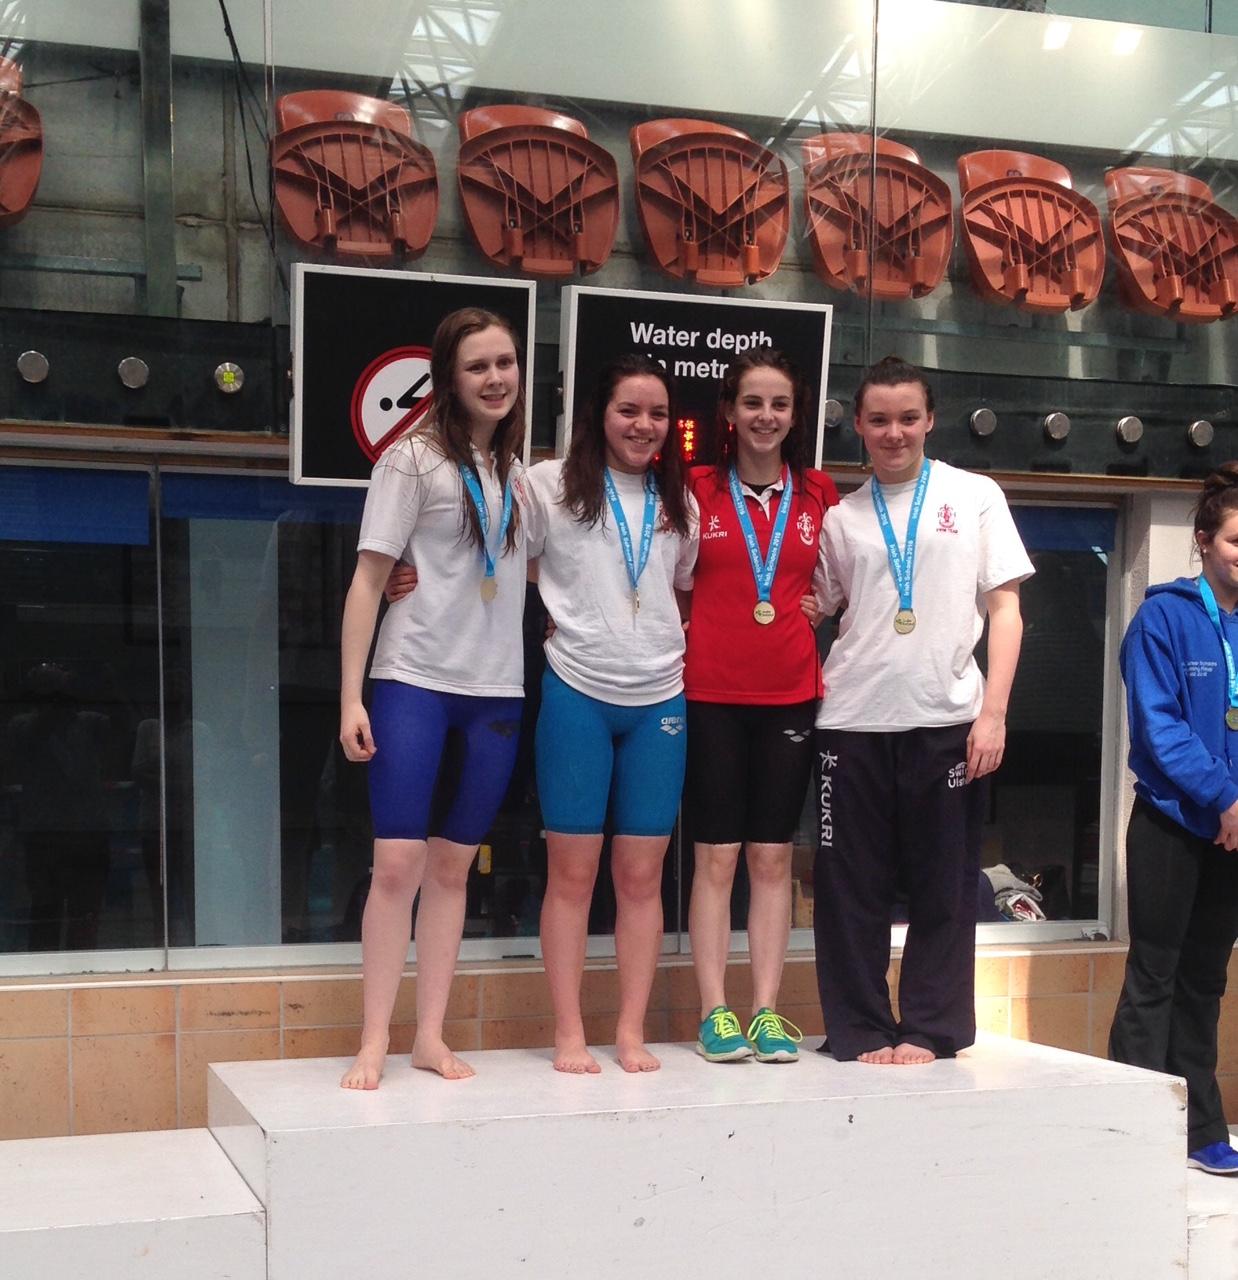 The Senior Girls Relay Team receiving their medals.jpg